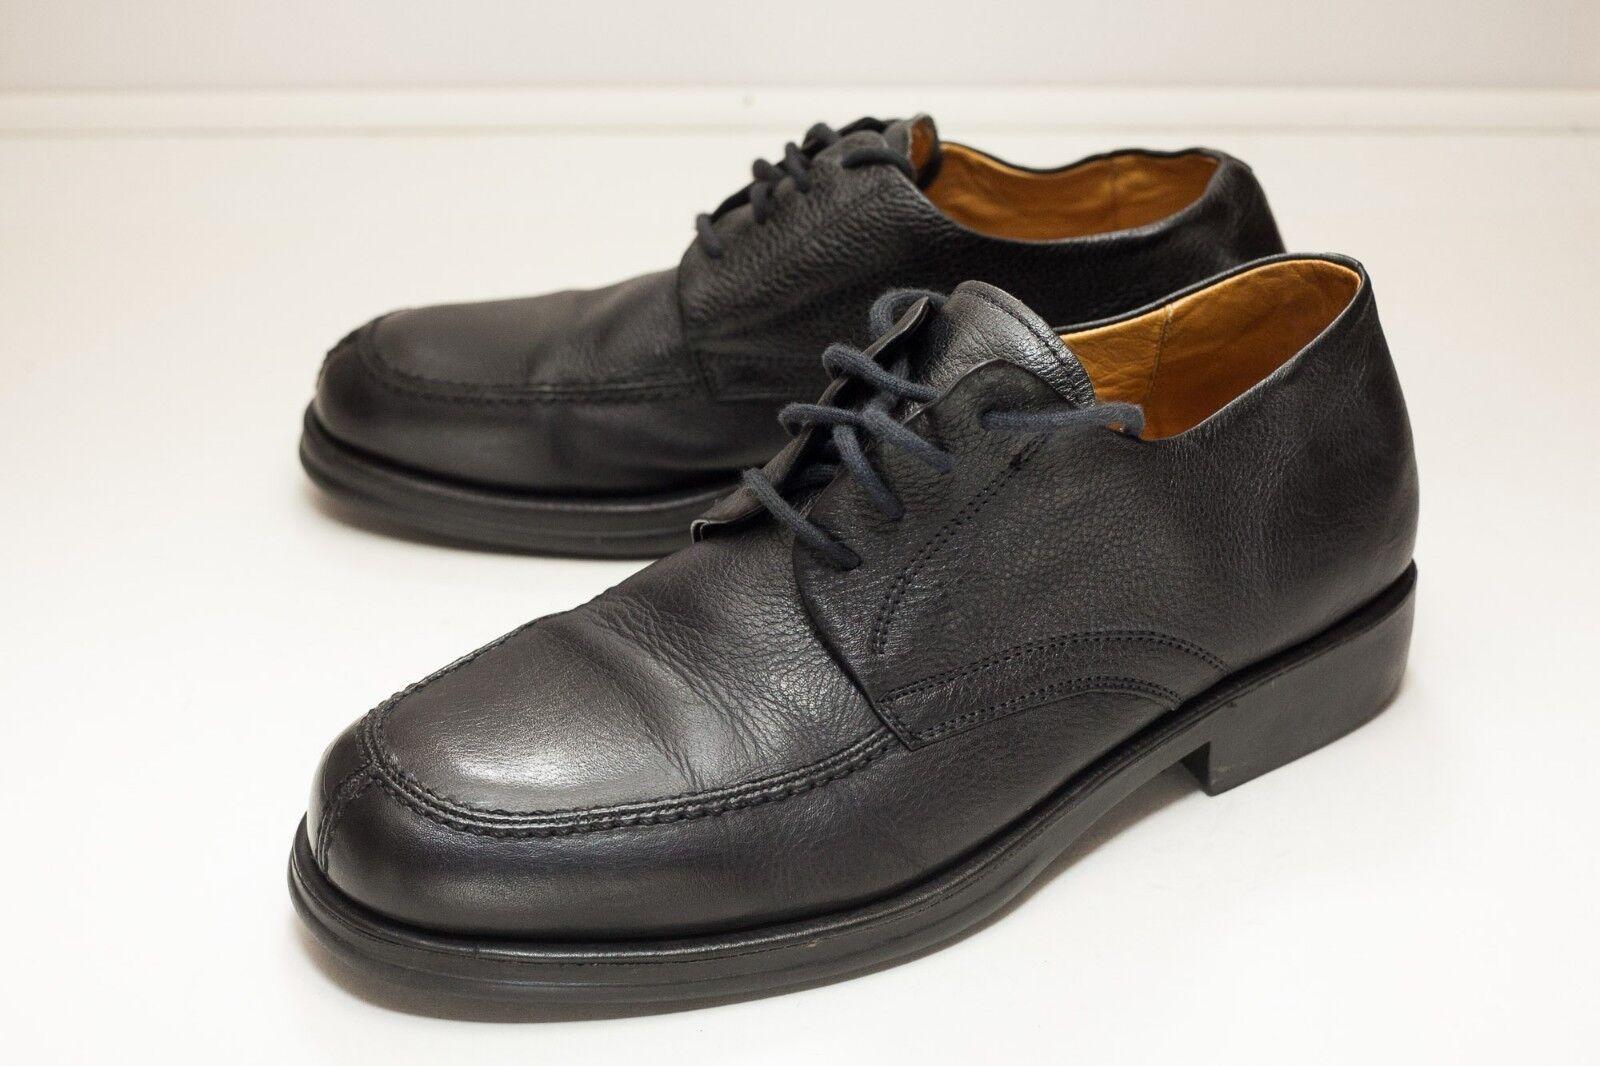 Sandro Moscoloni 10 Black Oxford Dress shoes Men's